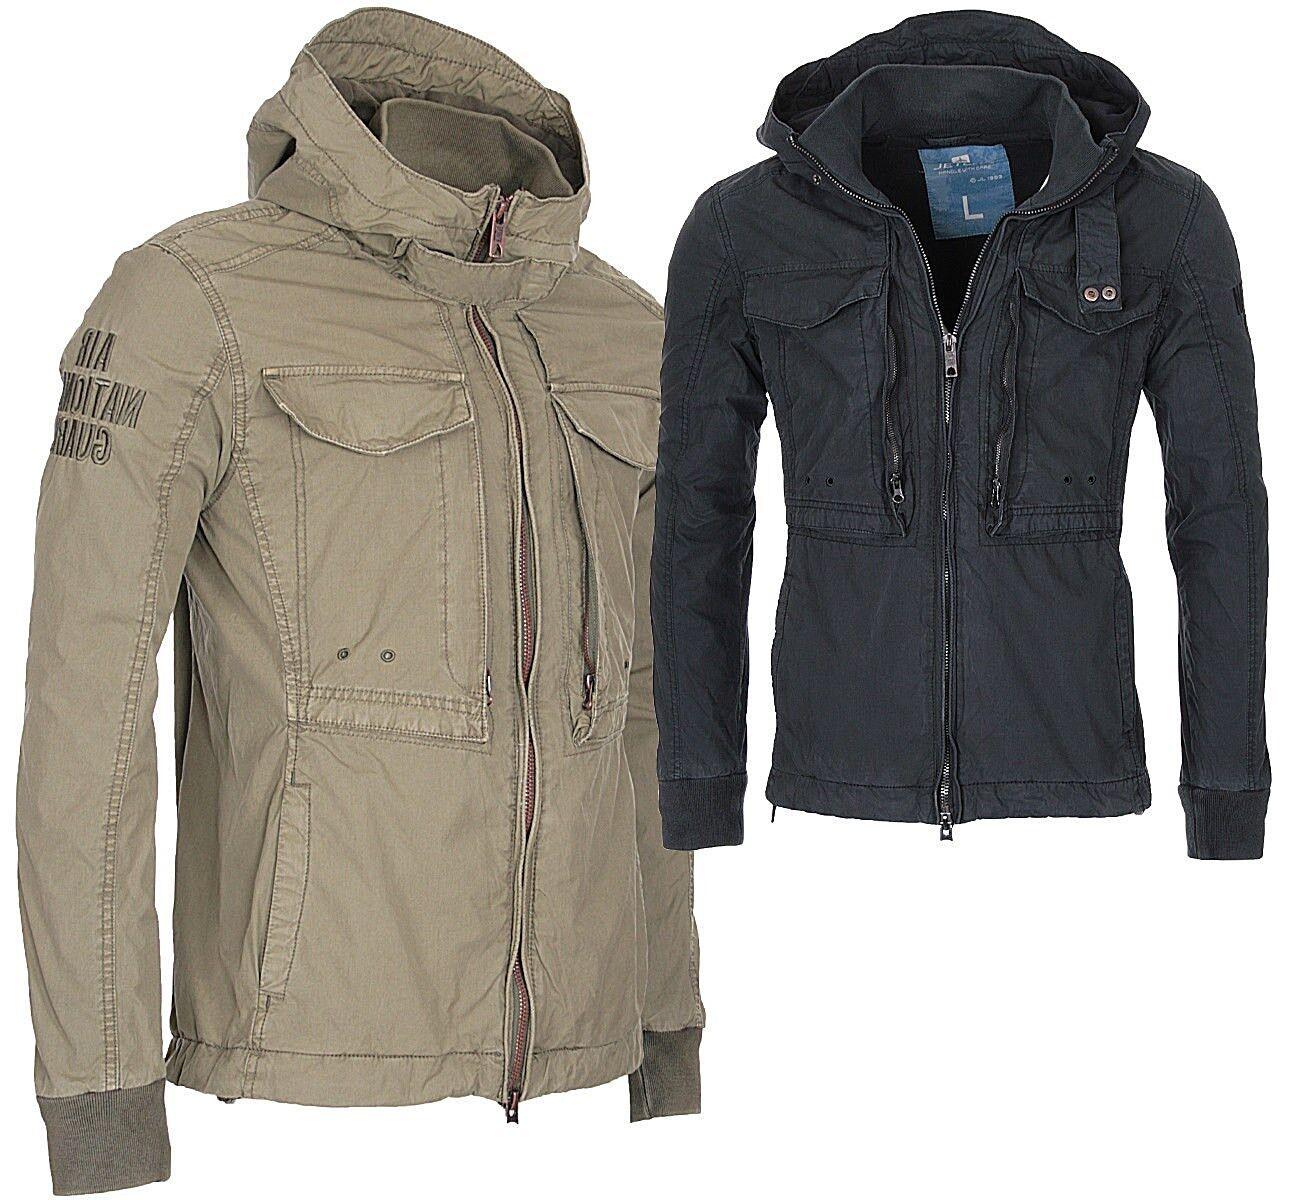 Мужская верхняя одежда Jet Lag Herren Herbst Jacke Parka Baumwoll Stehkragen Übergangsjacke Blouson